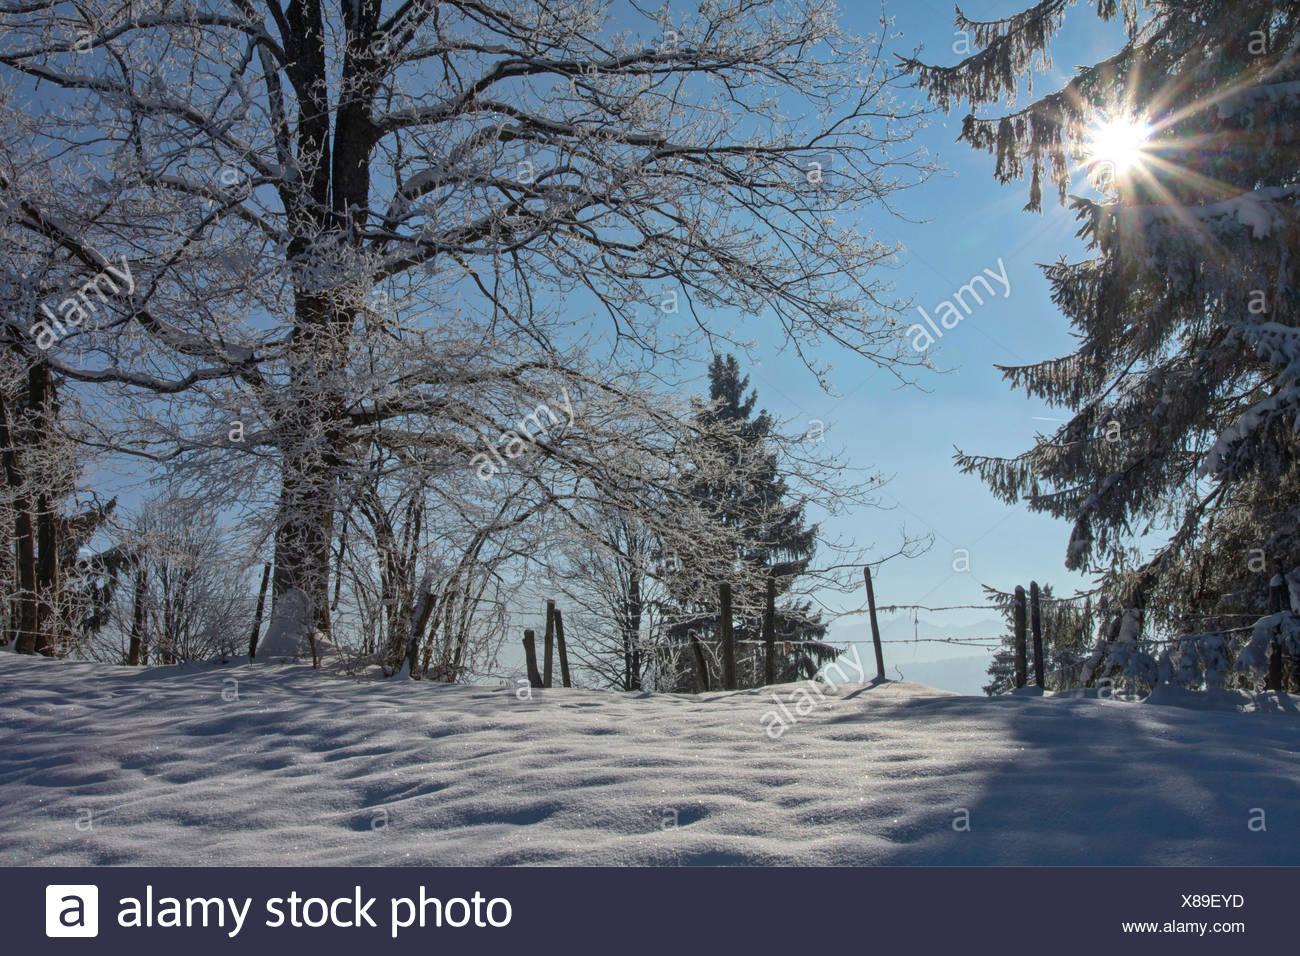 winter scenery, Germany, Bavaria, Oberbayern, Upper Bavaria - Stock Image